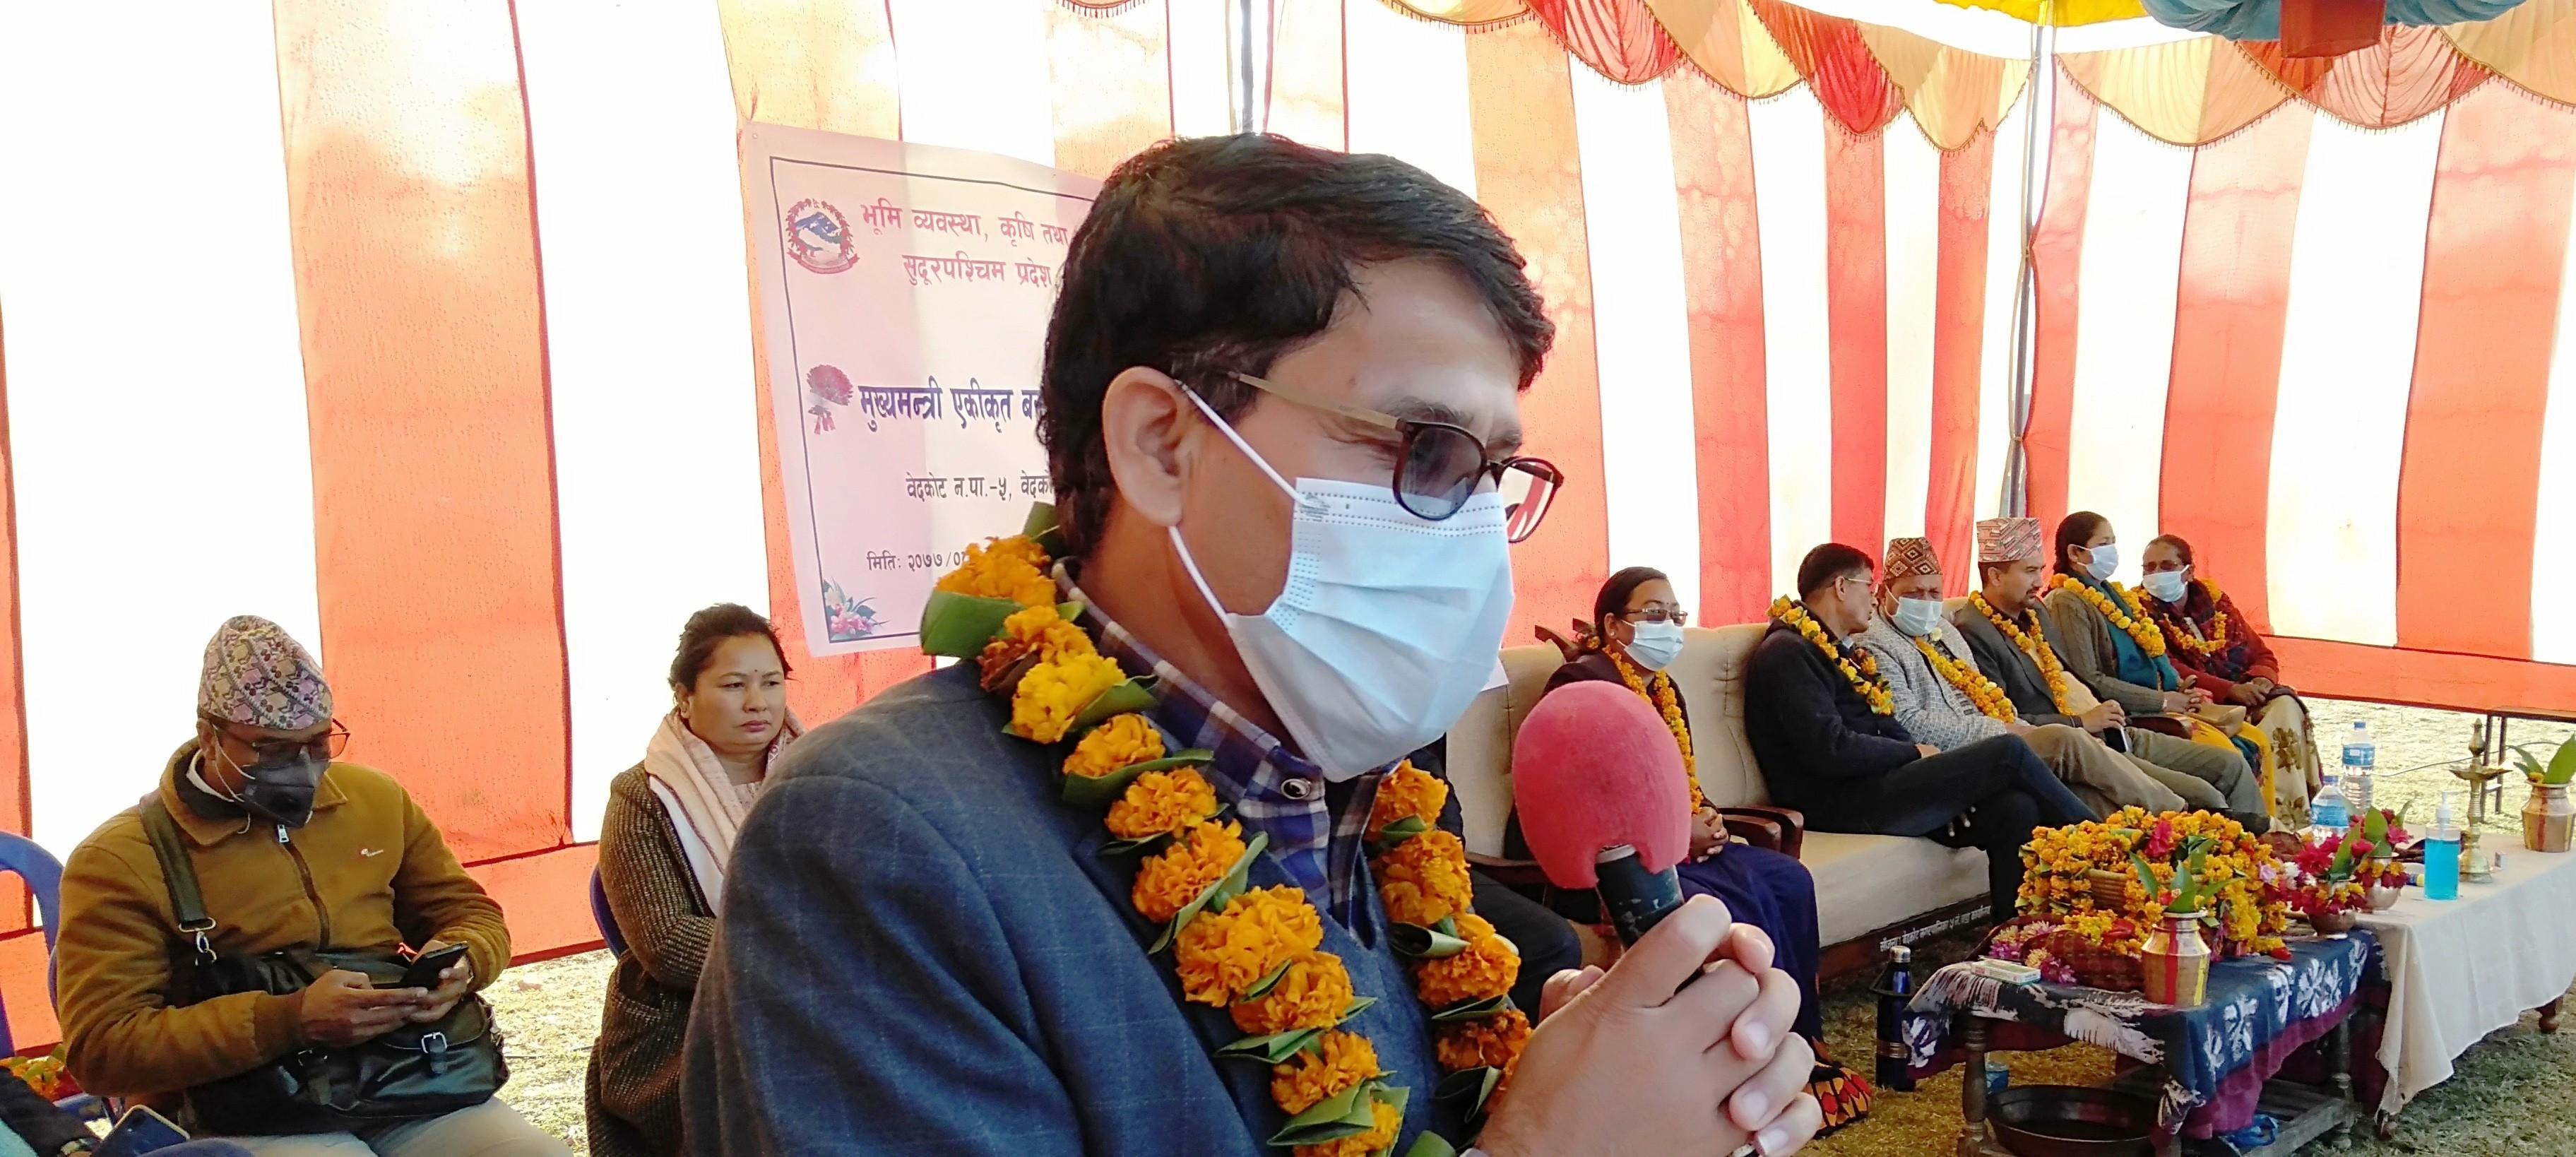 https://www.nepalbodh.com/pardesh-sarkar/1107